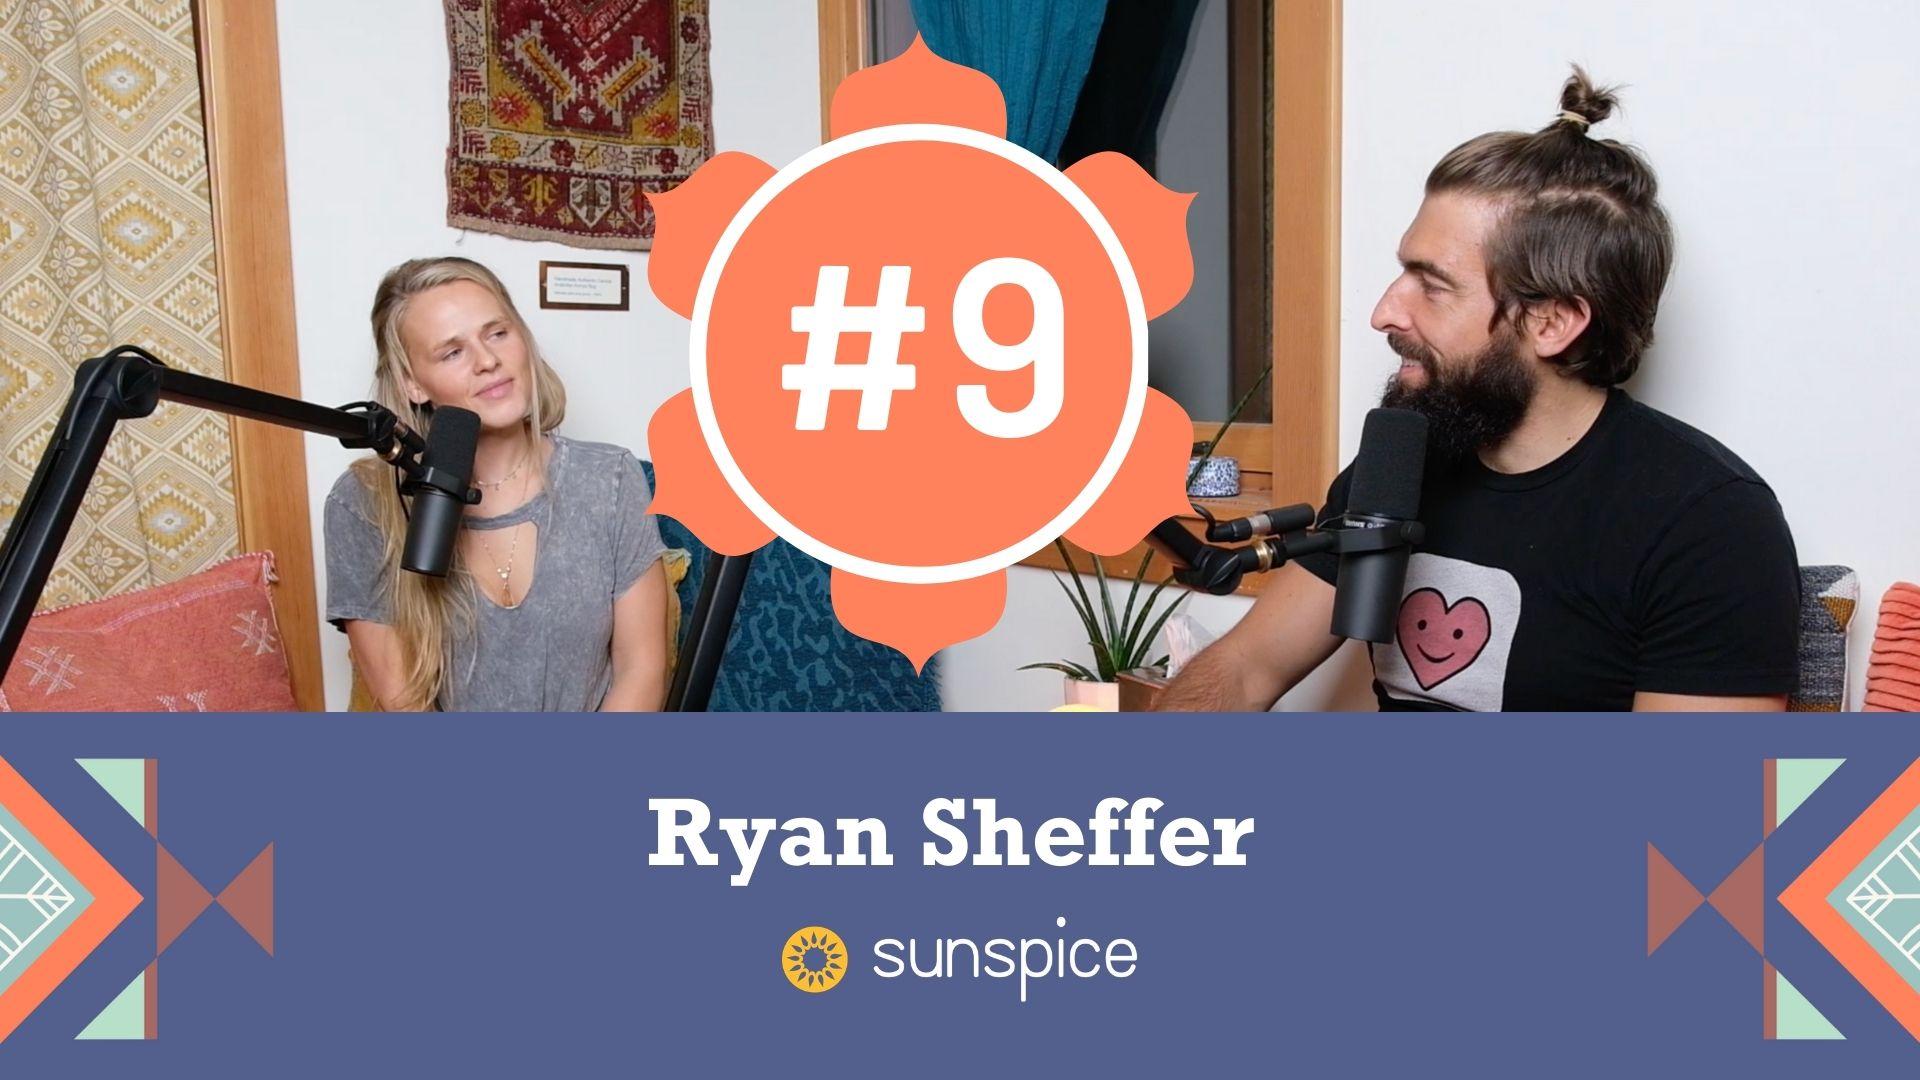 #9 Ryan Sheffer: Pheromones and birth control